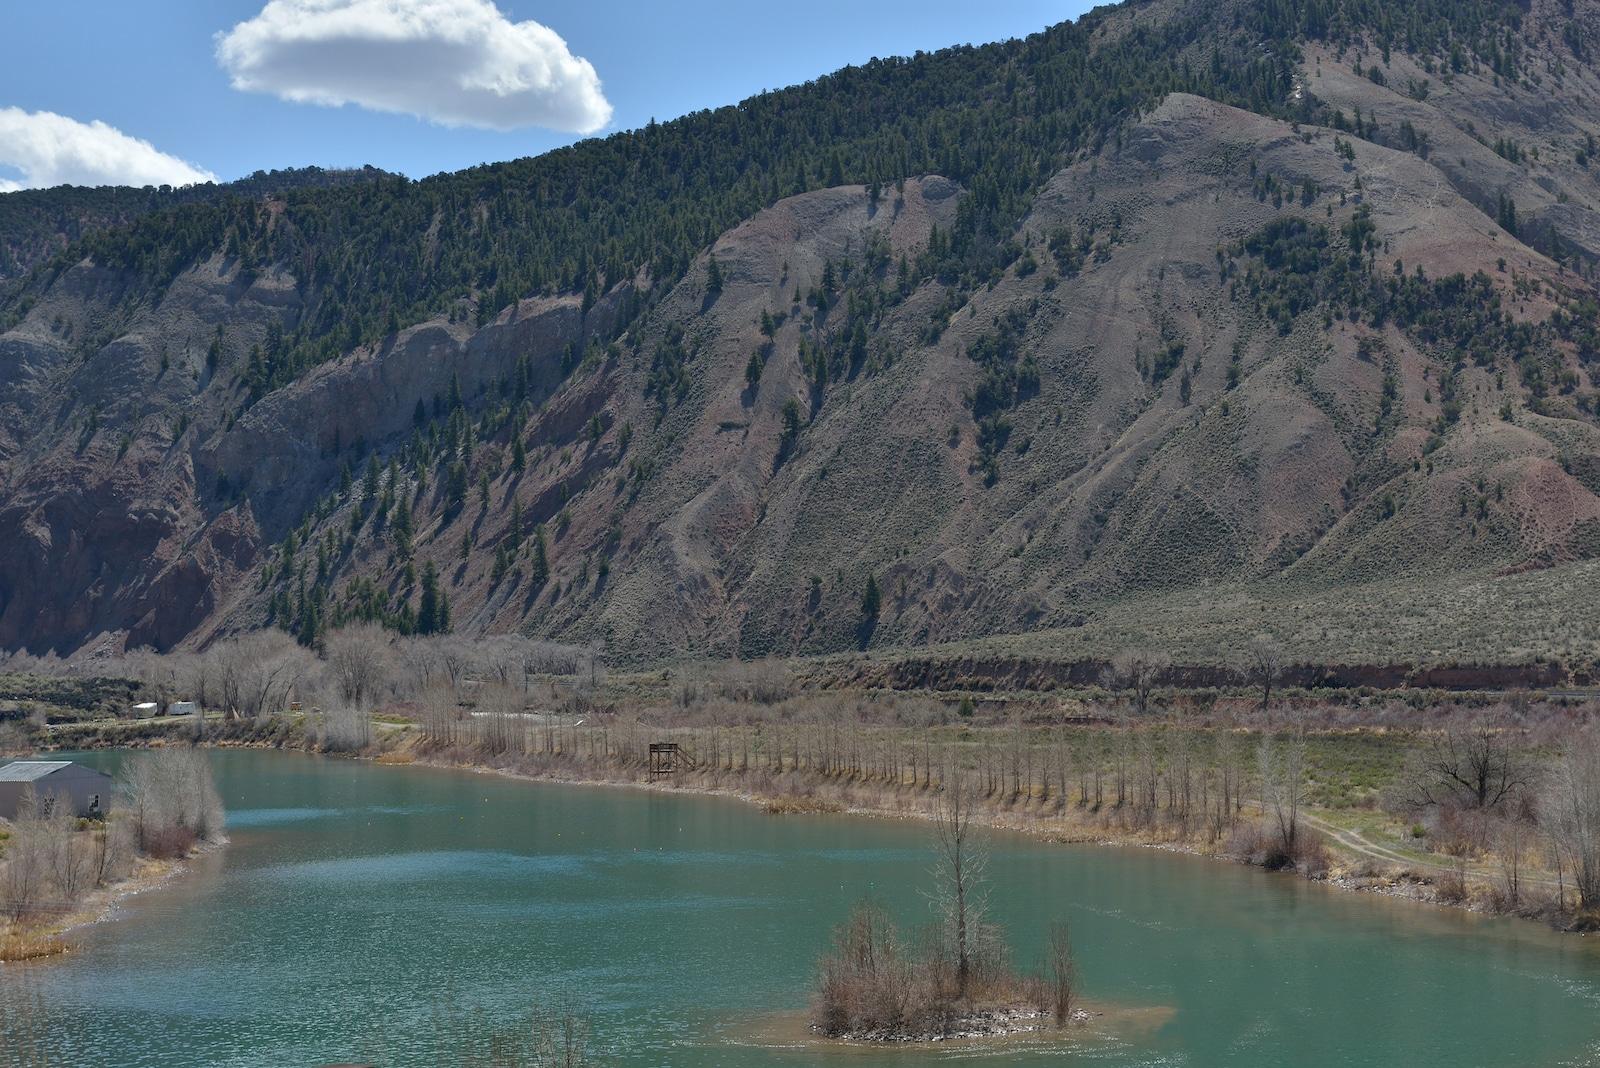 Lake at Confluence of Eagle River and Colorado River in Dotsero CO